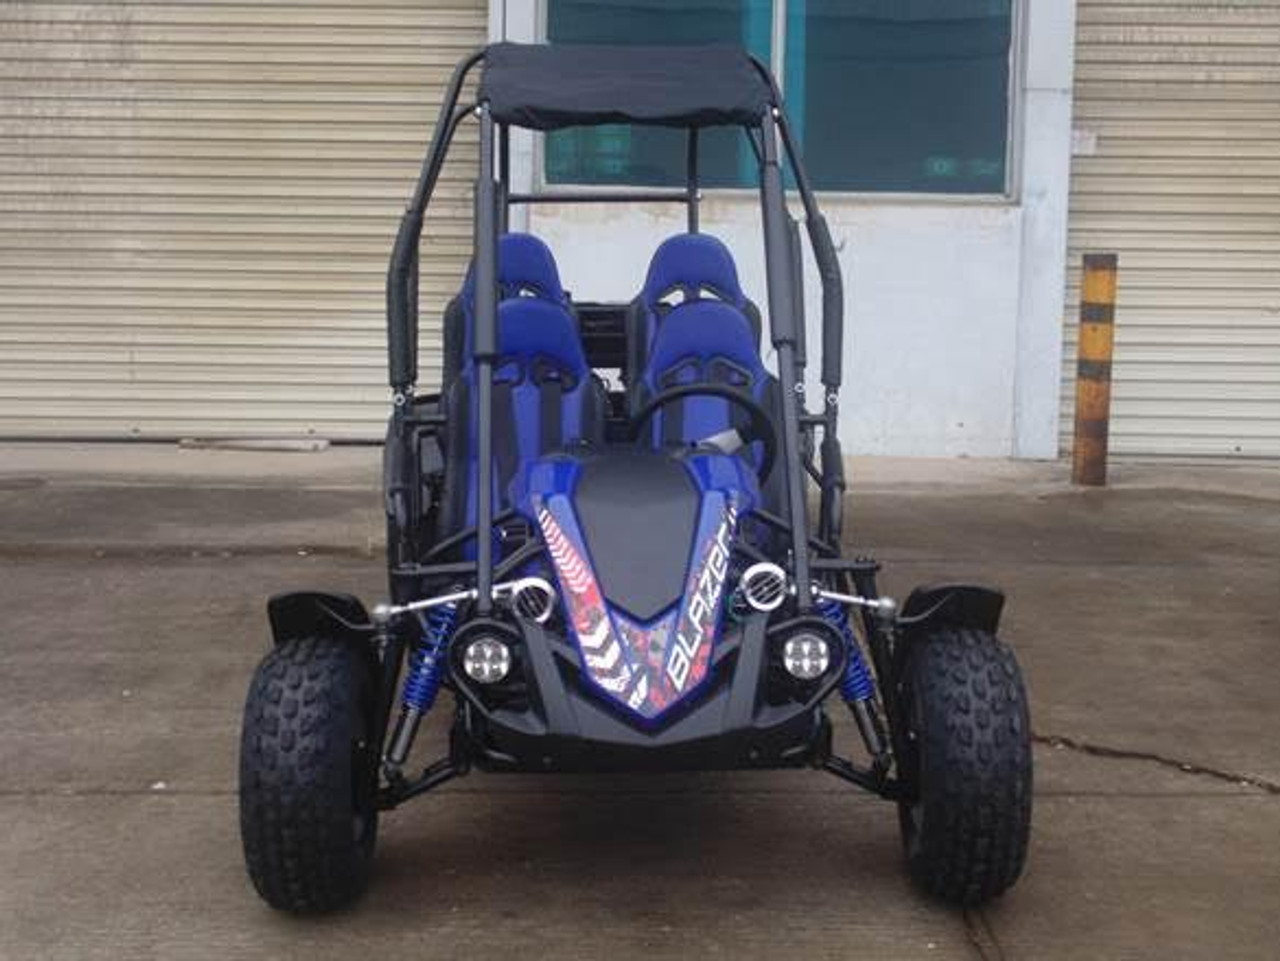 TrailMaster Blazer4 150CC Family Size 4-Seater Go Kart